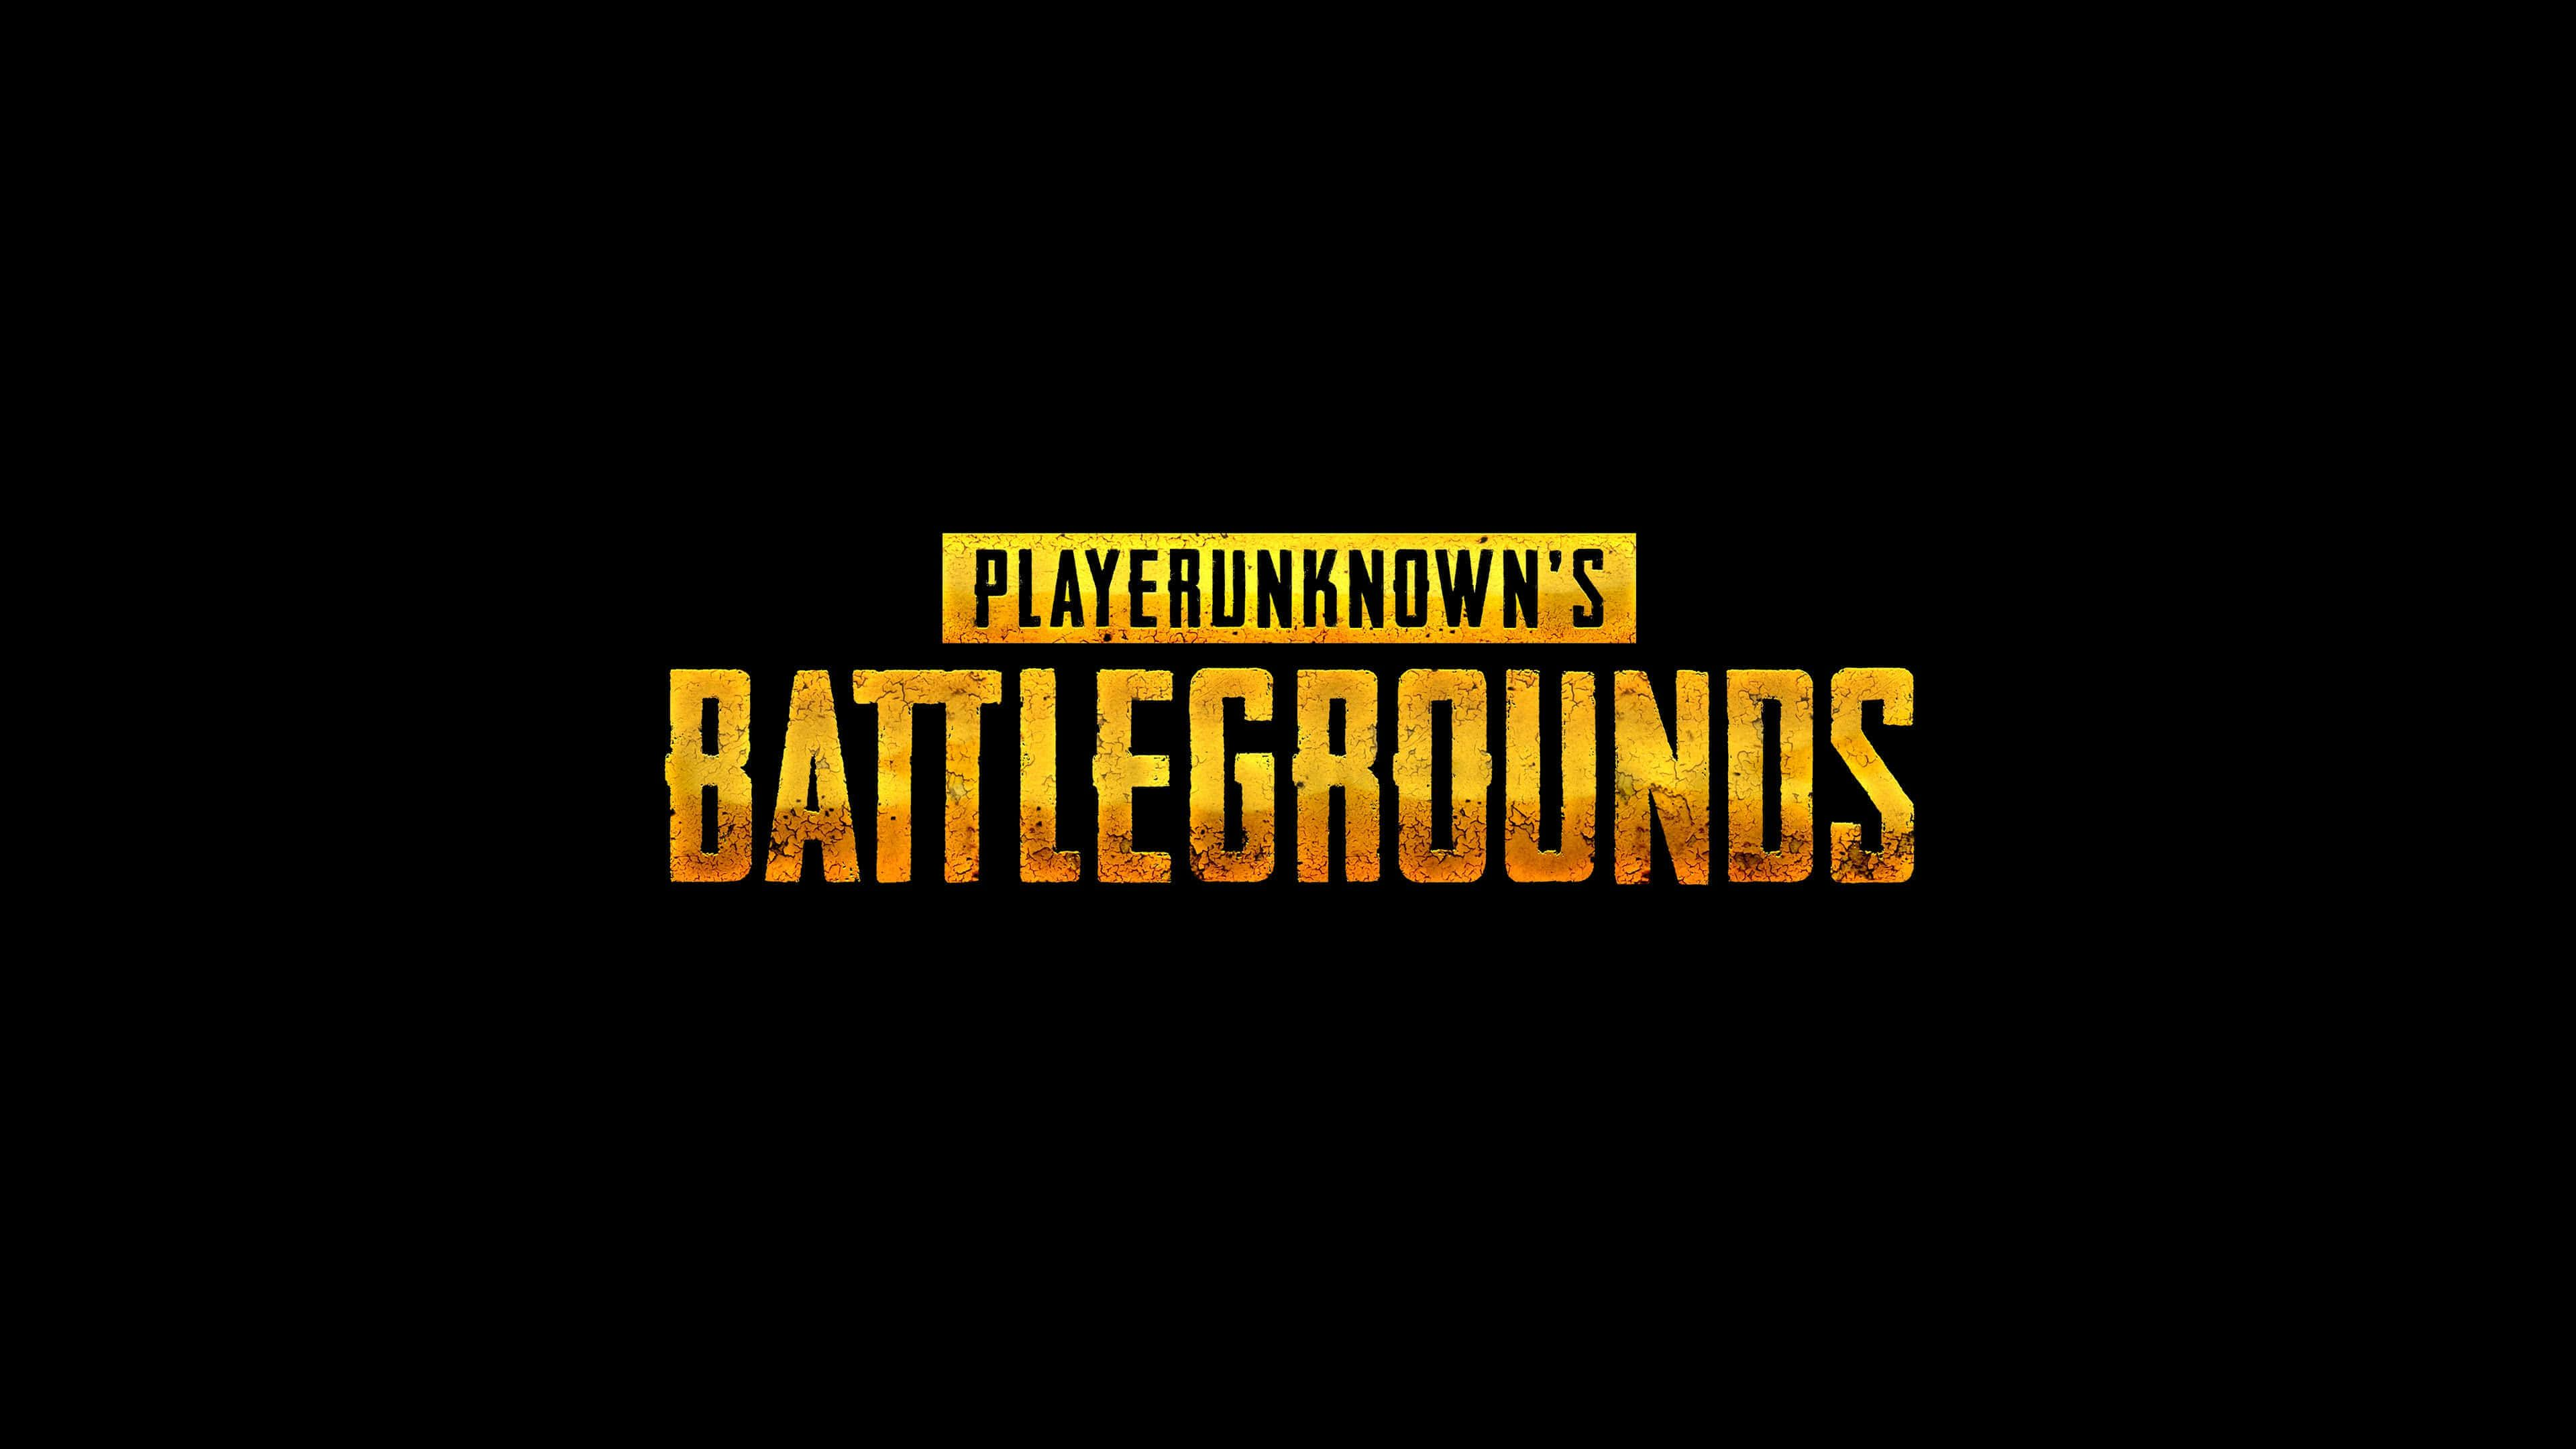 Pubg Playerunknown S Battlegrounds Logo Wallpaper Pubg Wallpaper Pubg Logo Desain Logo Rajutan Lucu Gambar